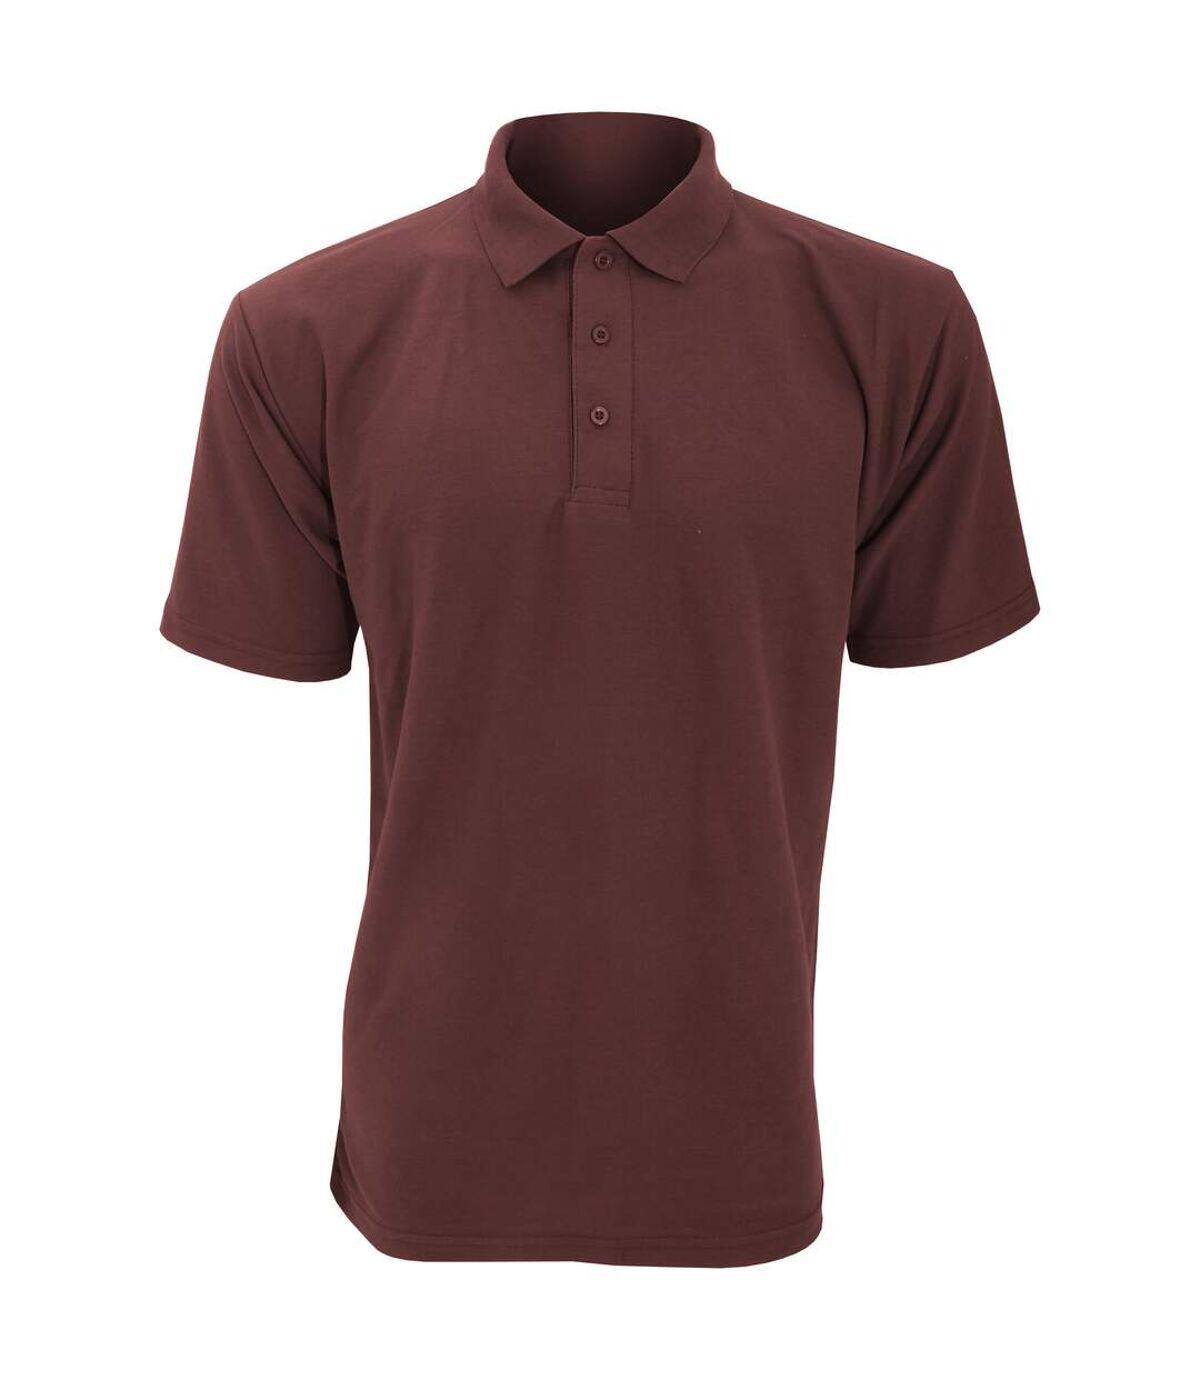 UCC 50/50 Mens Plain Piqué Short Sleeve Polo Shirt (Burgundy) - UTBC1194